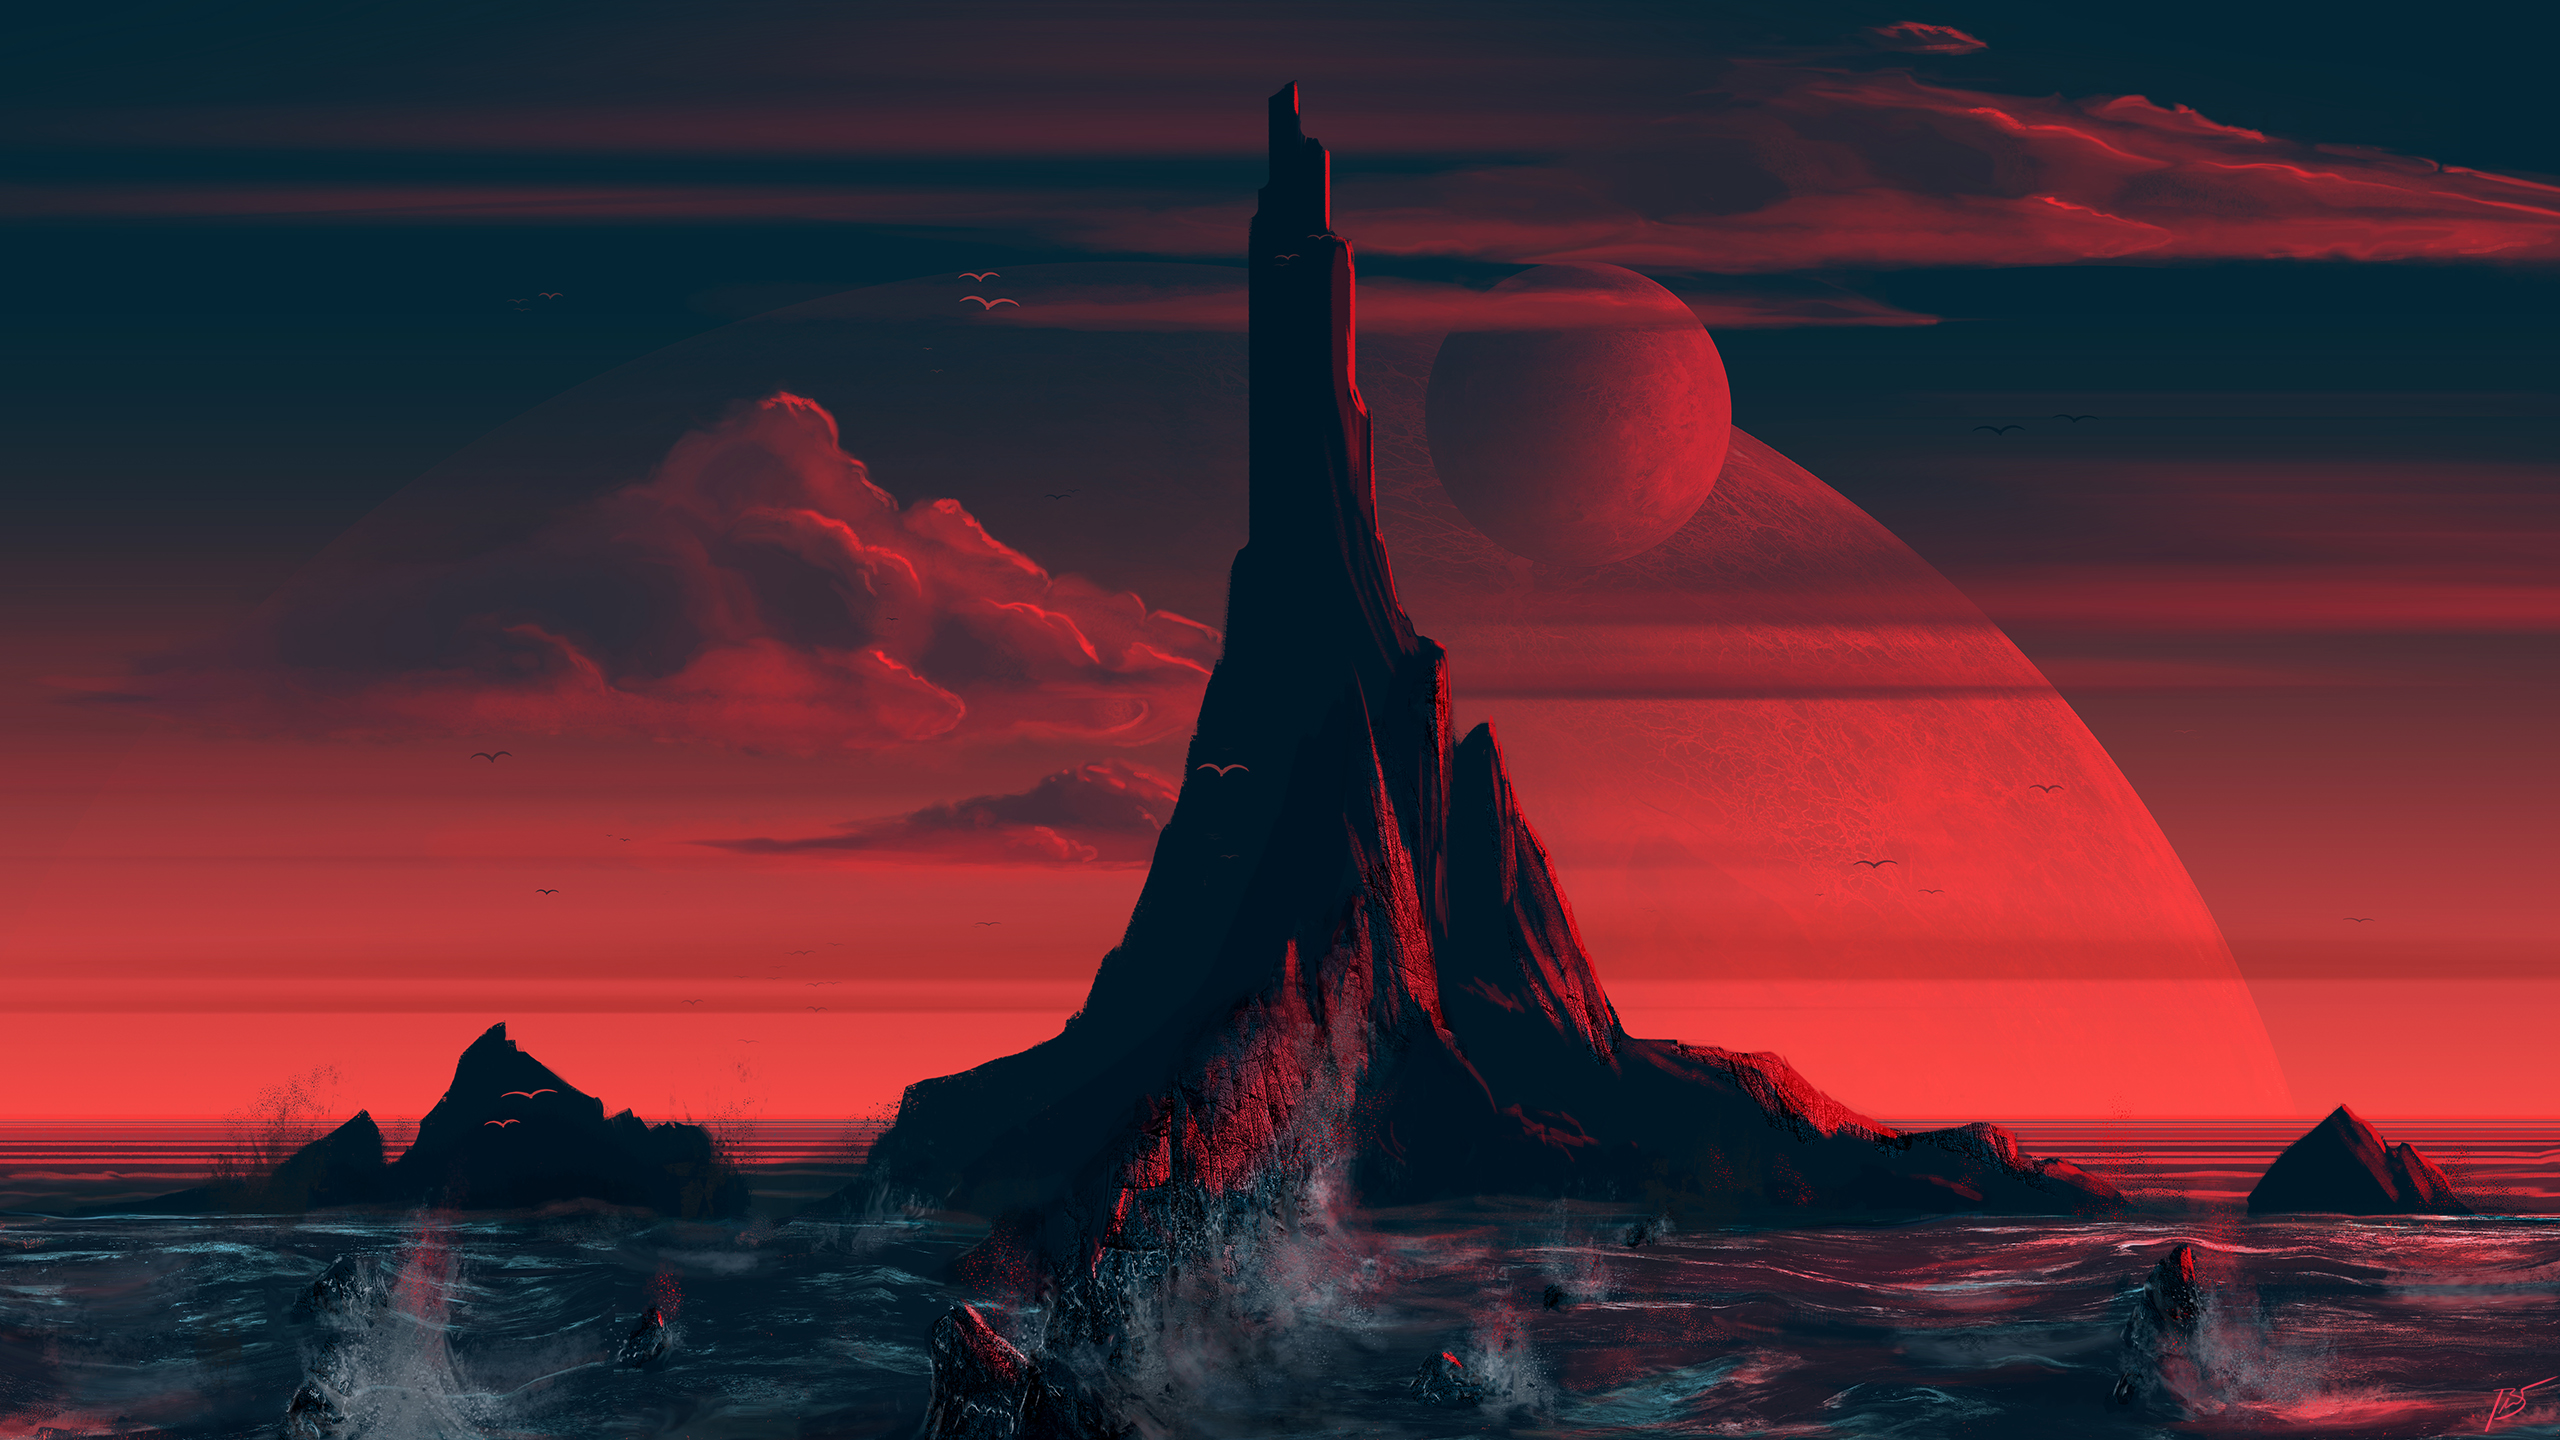 General 2560x1440 island landscape digital art JoeyJazz sea artwork clouds dark